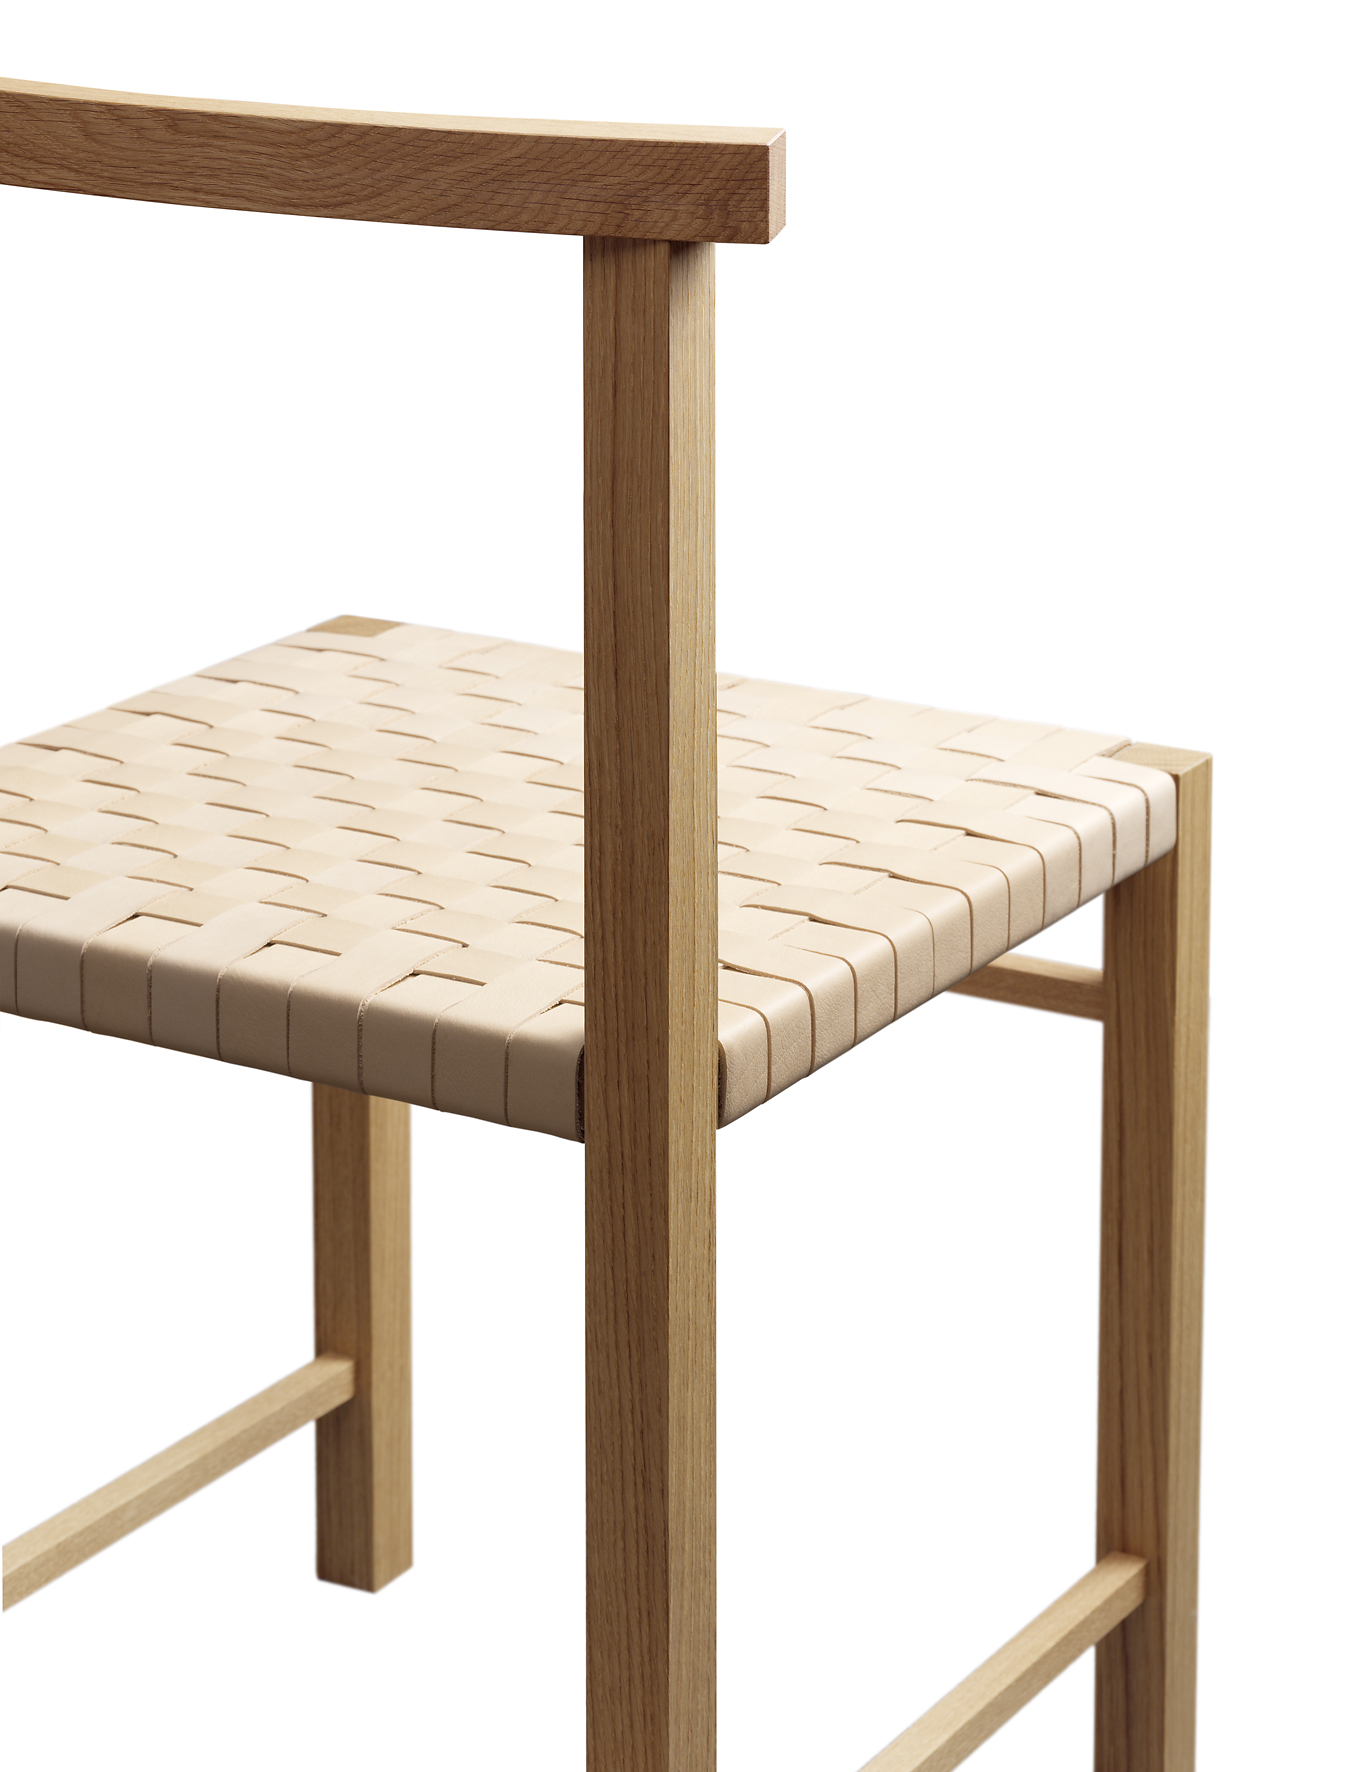 wooden chair karnak e15 cbe heated cooled chair